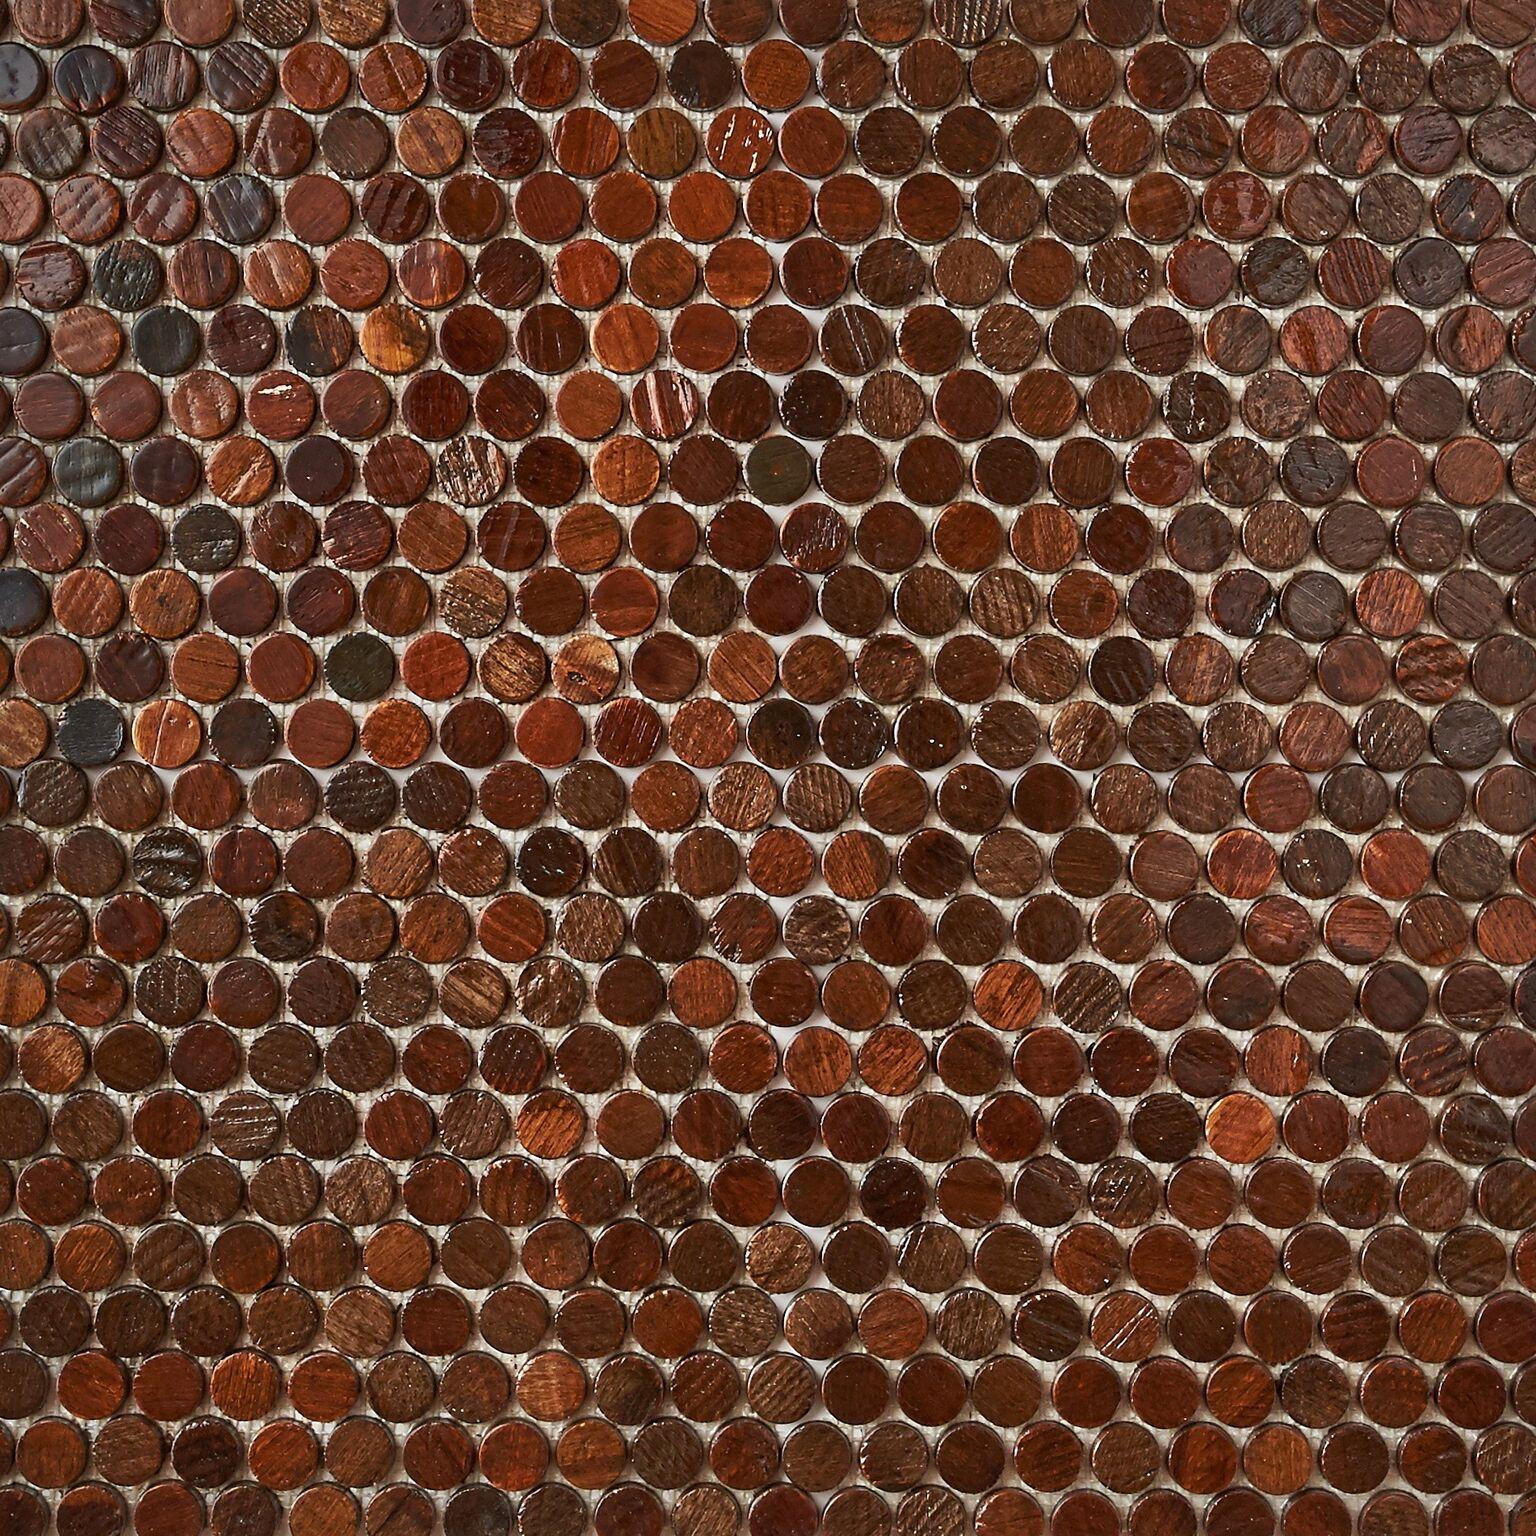 patina resin finish 2 - Teak Tile - Bead